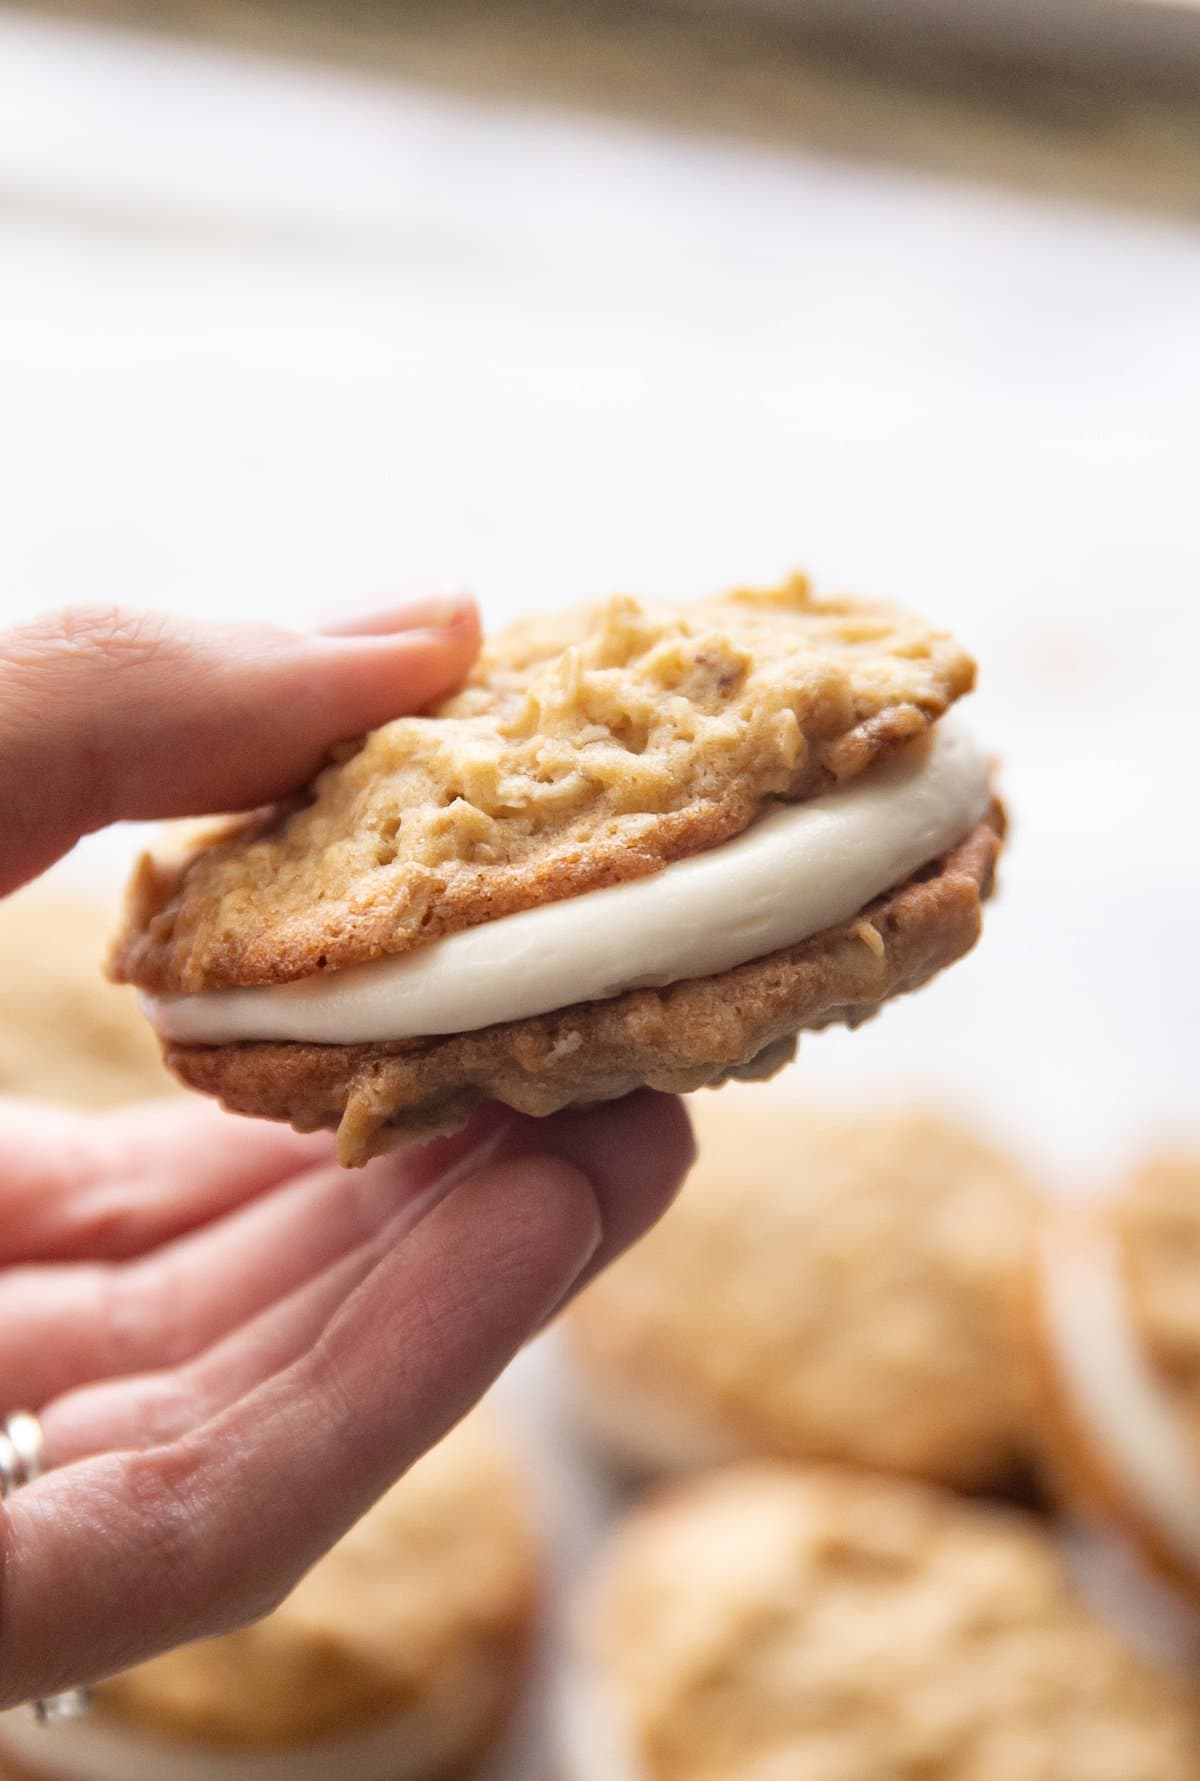 A hand holding an oatmeal cream pie